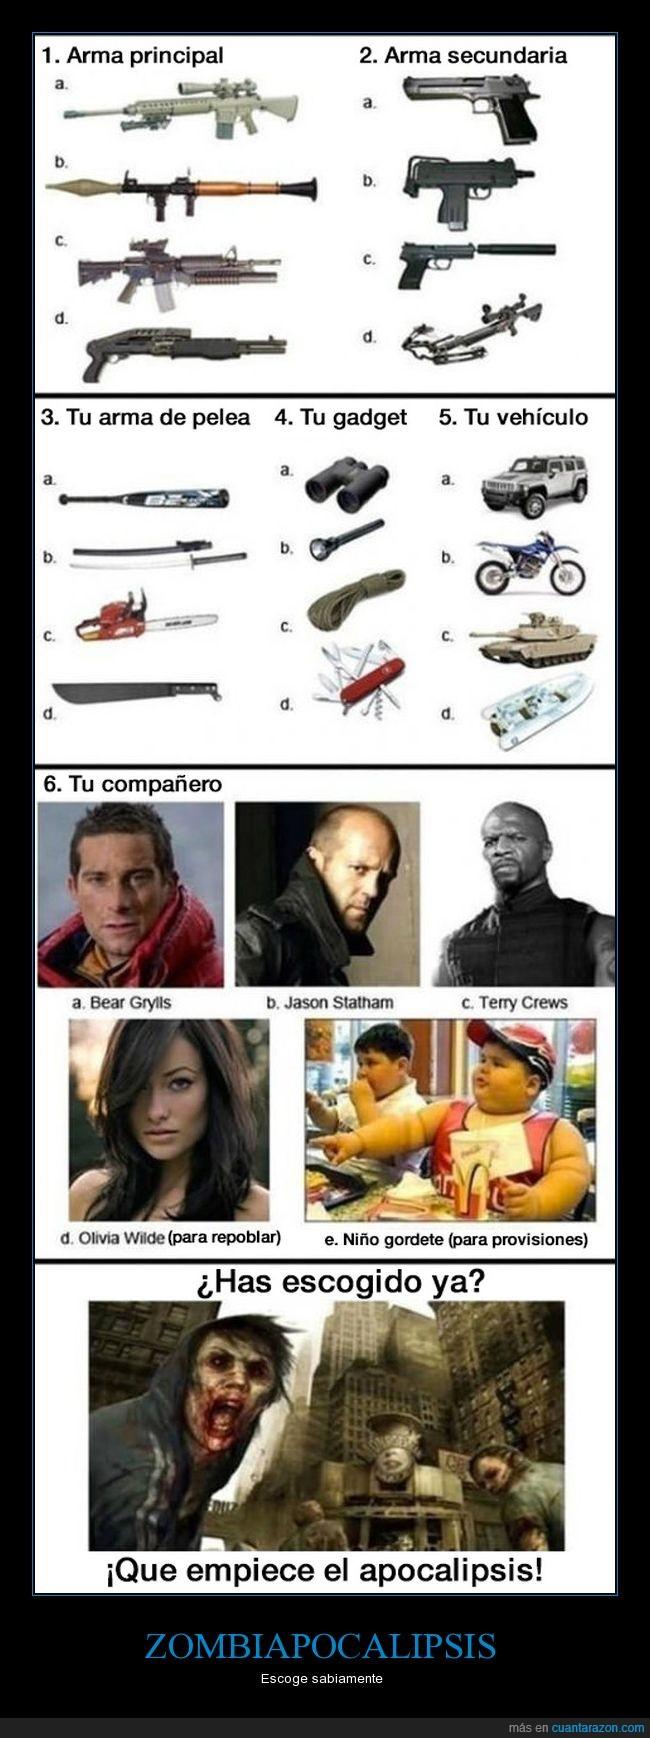 apocalipsis,armas,supervivencia,zombies